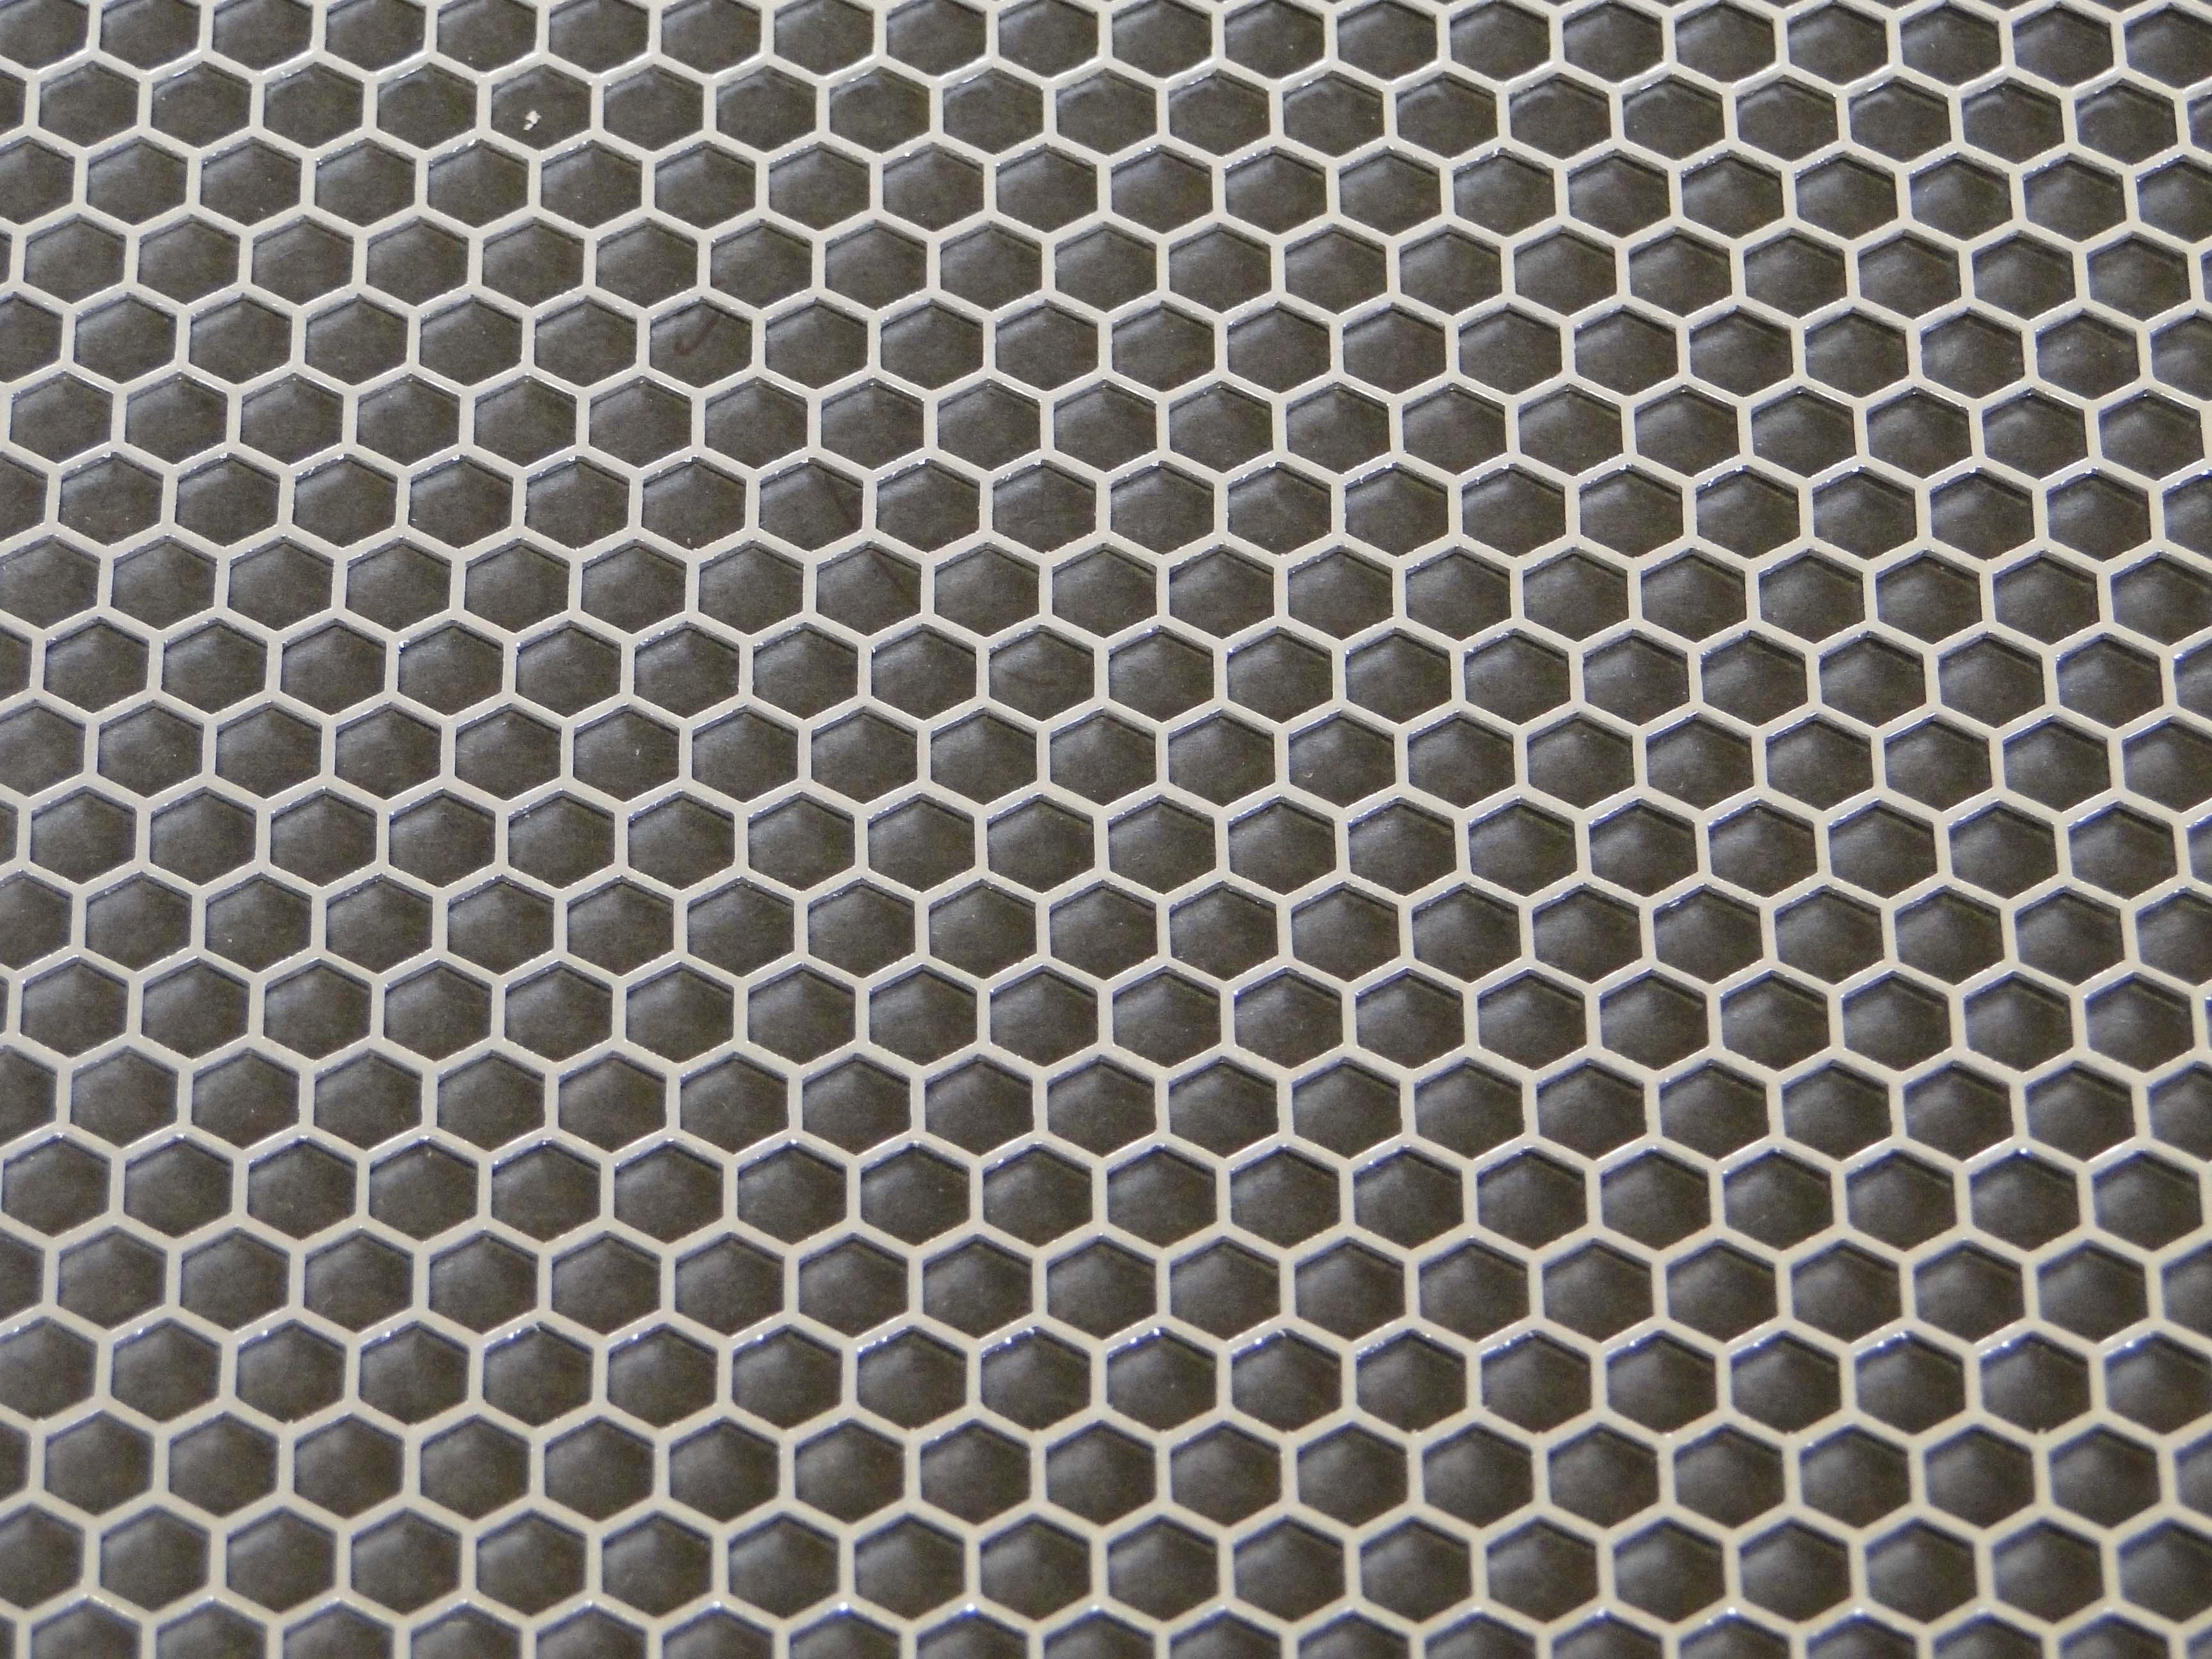 Aluminum Honeycomb Mesh